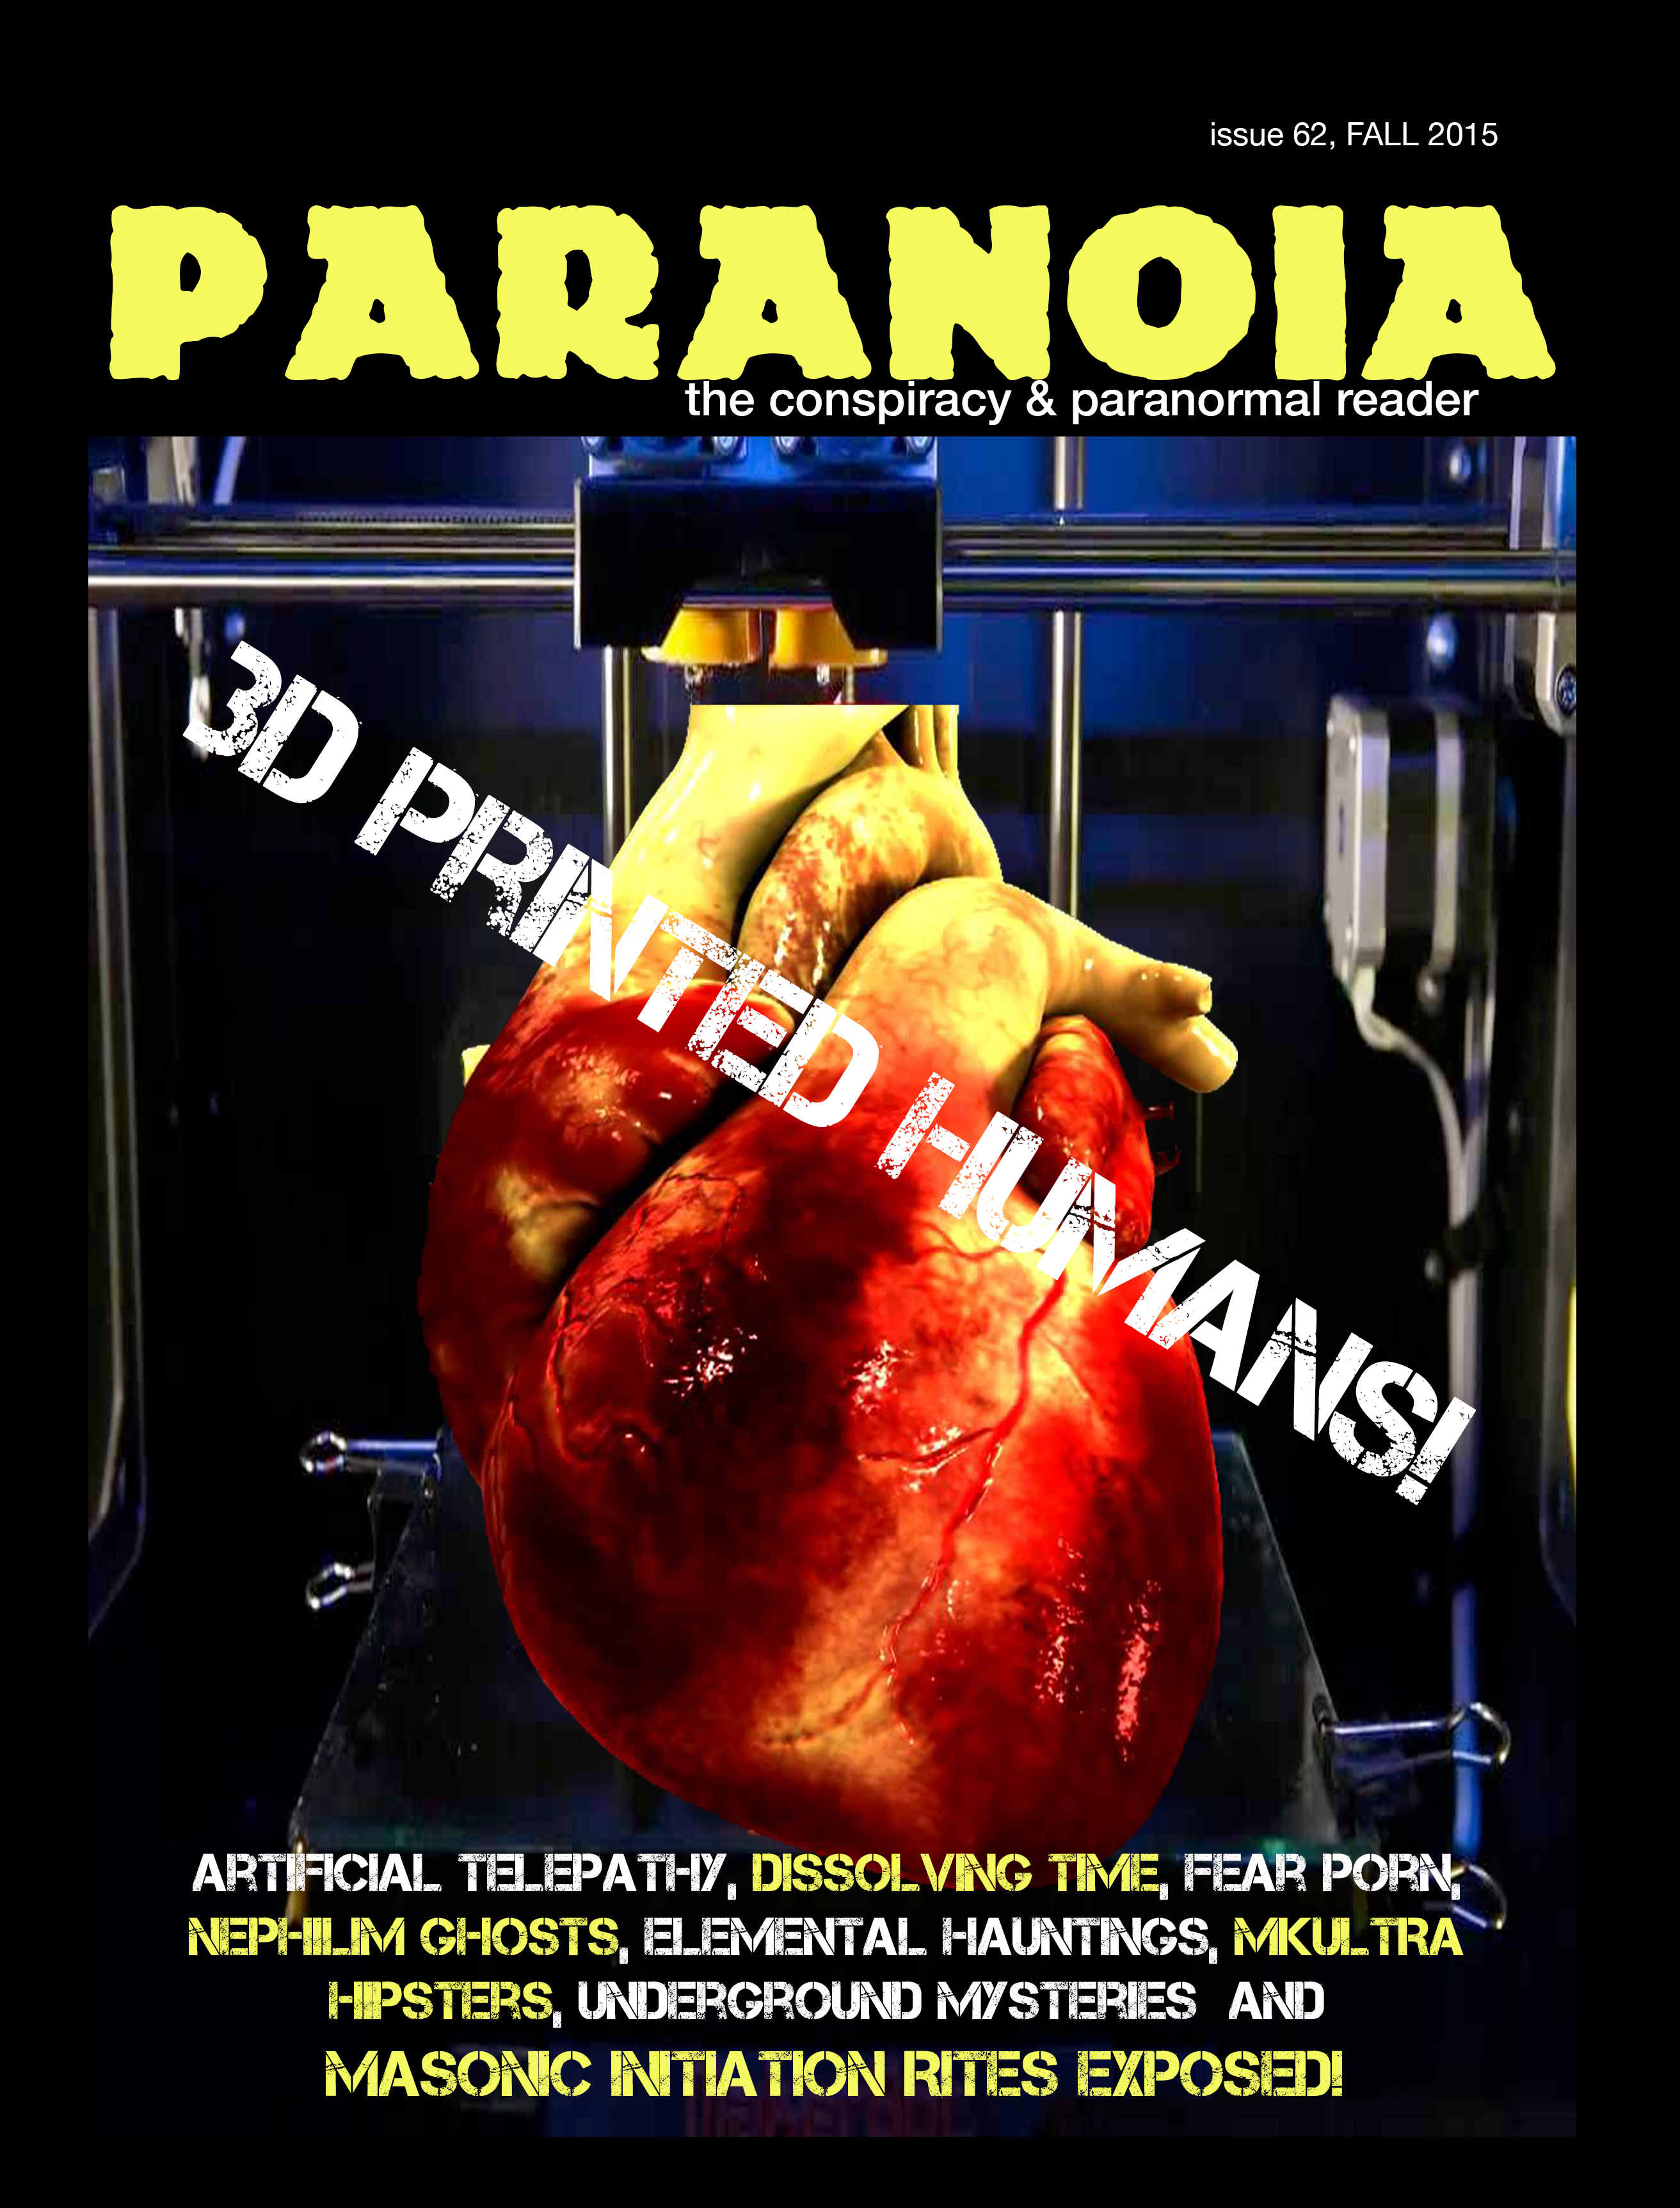 Paranioa